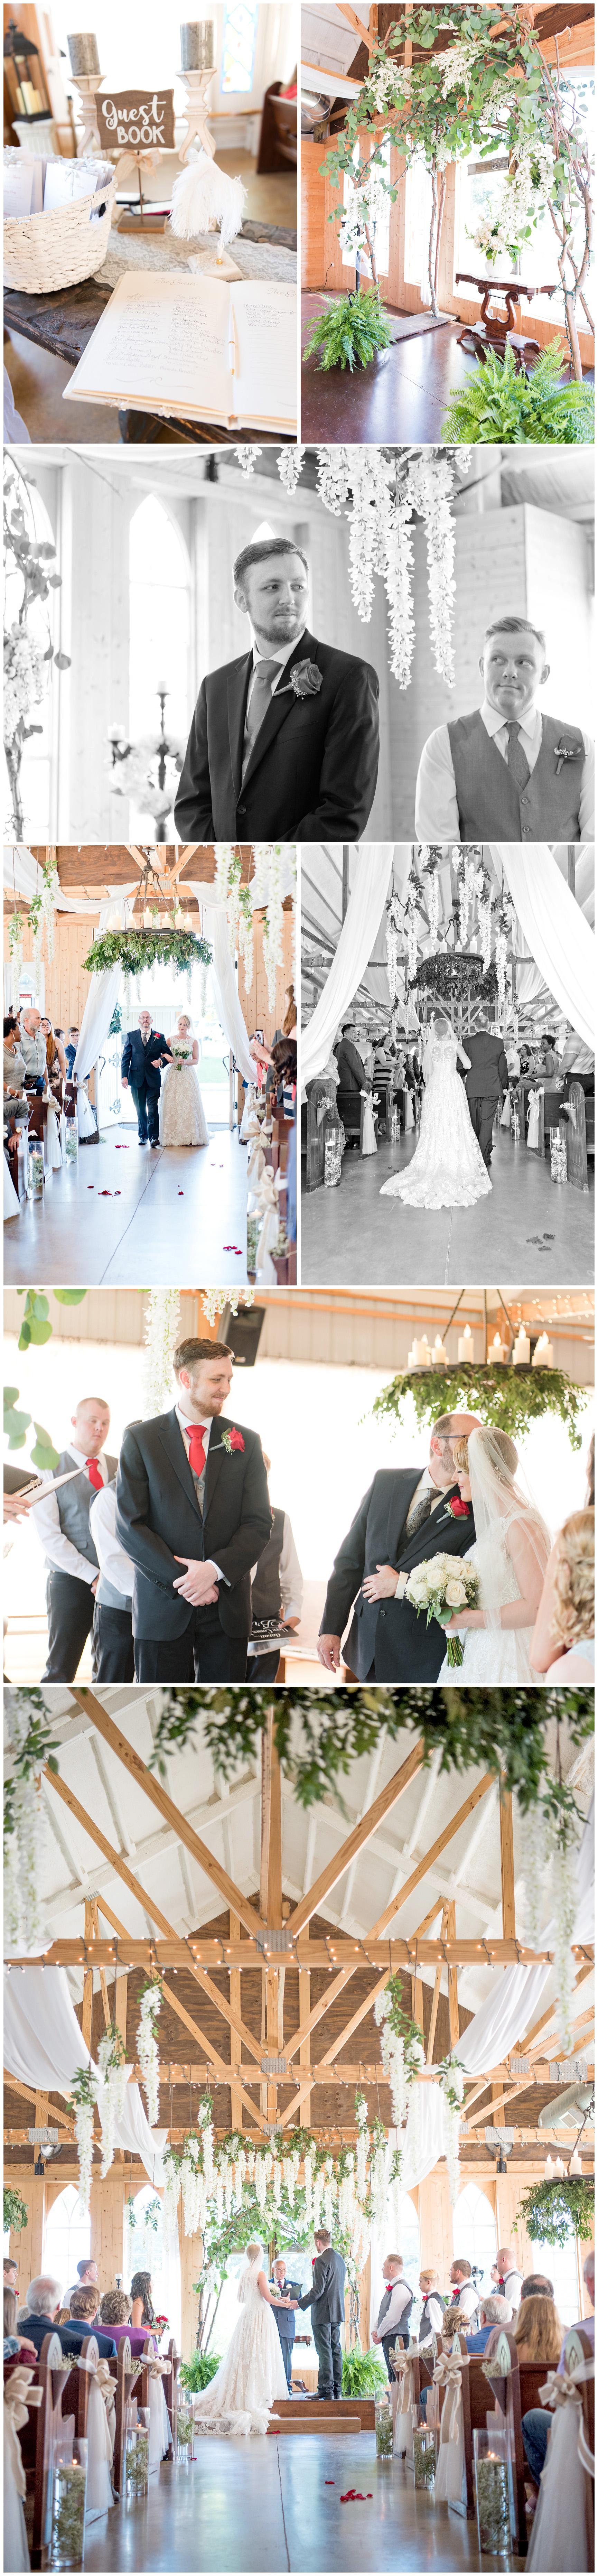 Stillwater Meadow Wedding Venue